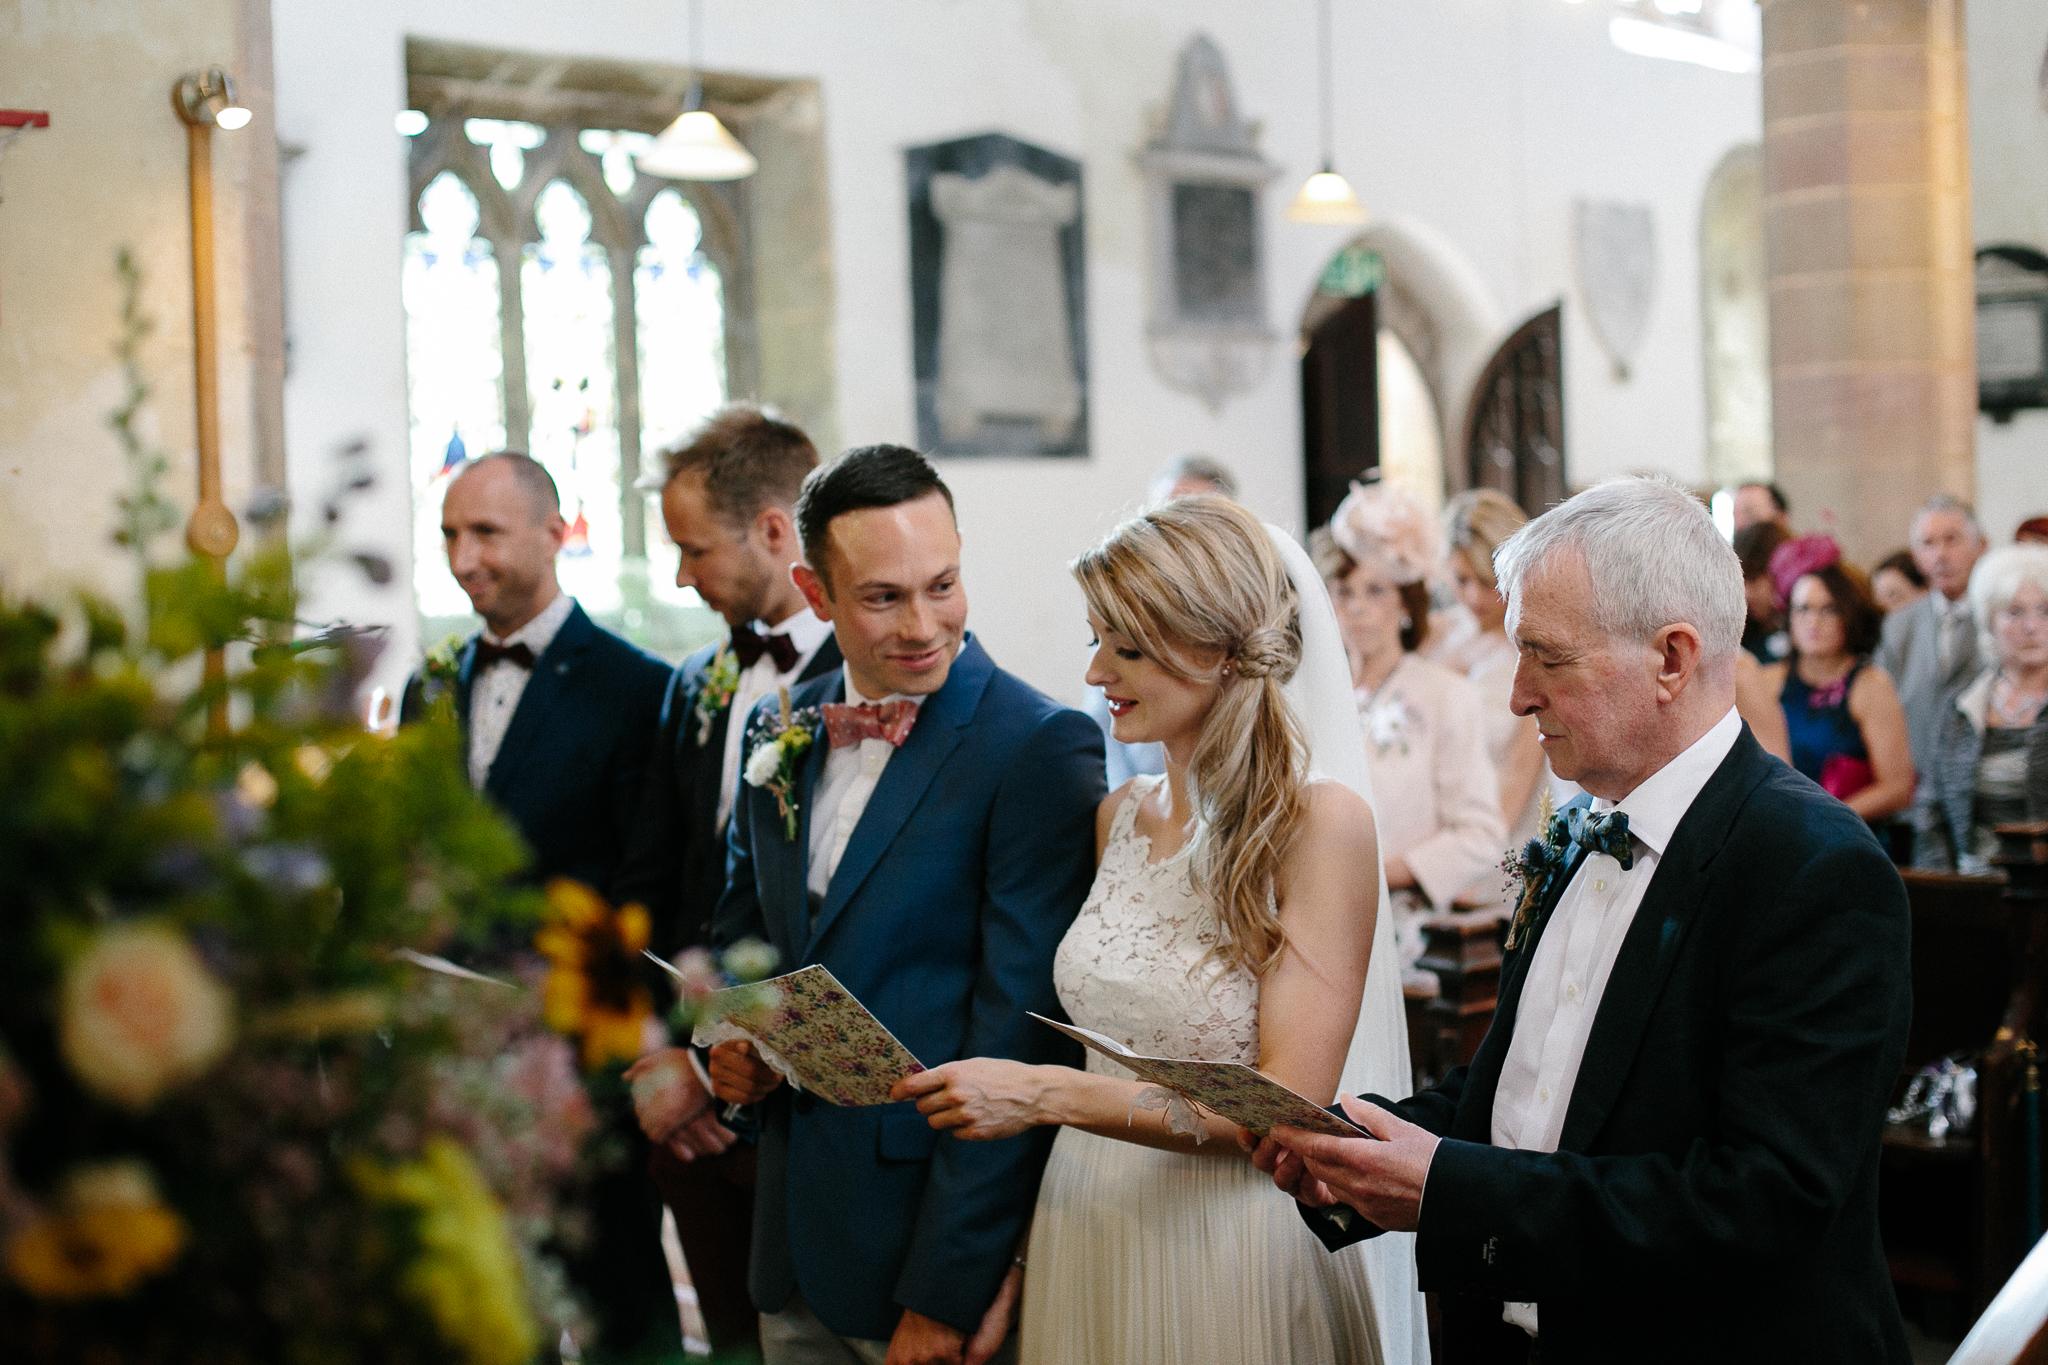 grantham_wedding_photographer-45.jpg